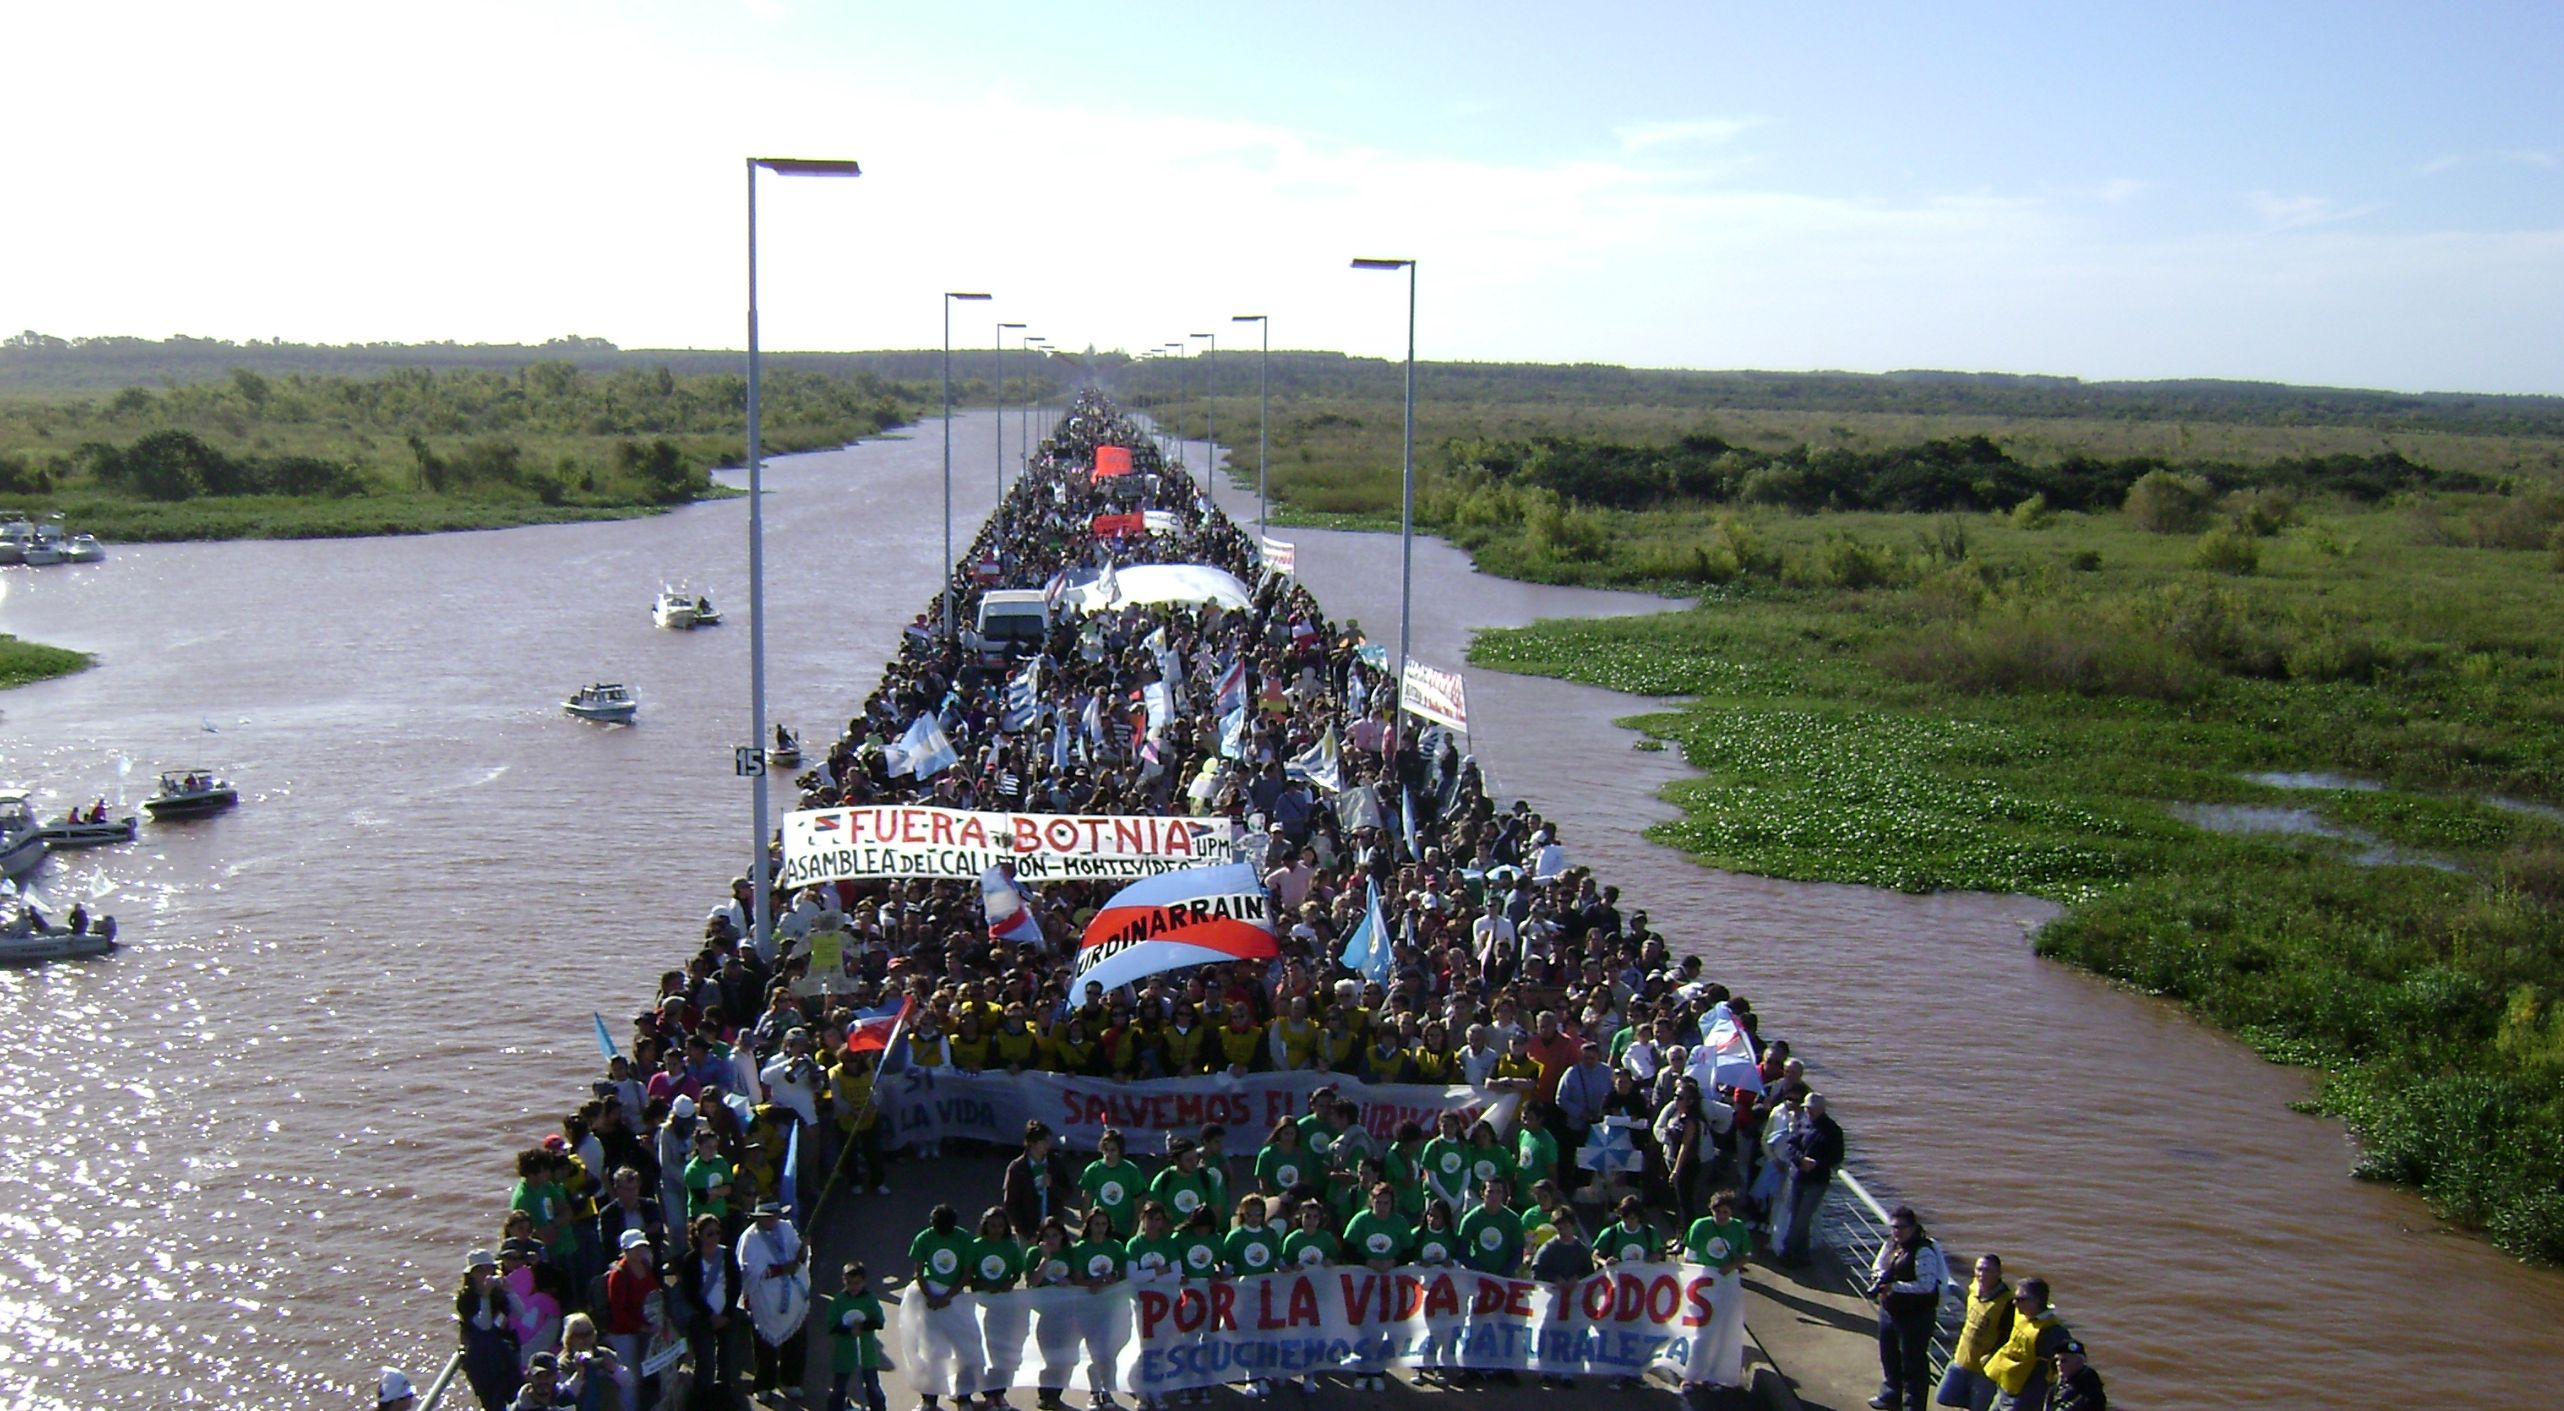 marcha-contra-upm-ex-botnia-gualeguaychc3ba-7-de-mayo-de-20112